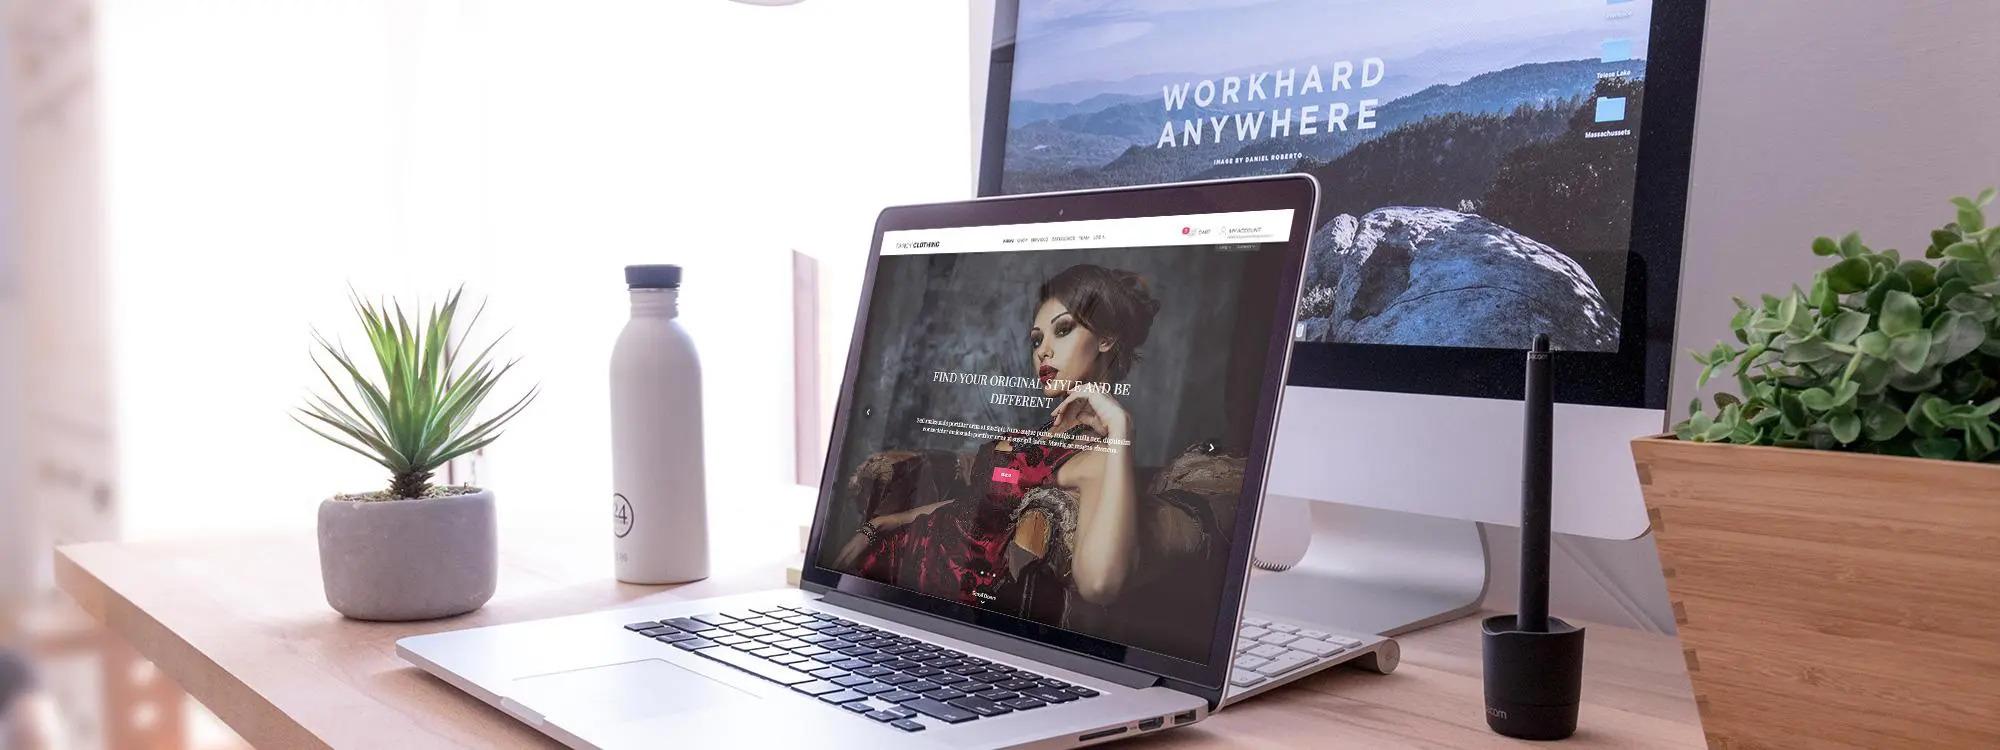 Retail online busizness